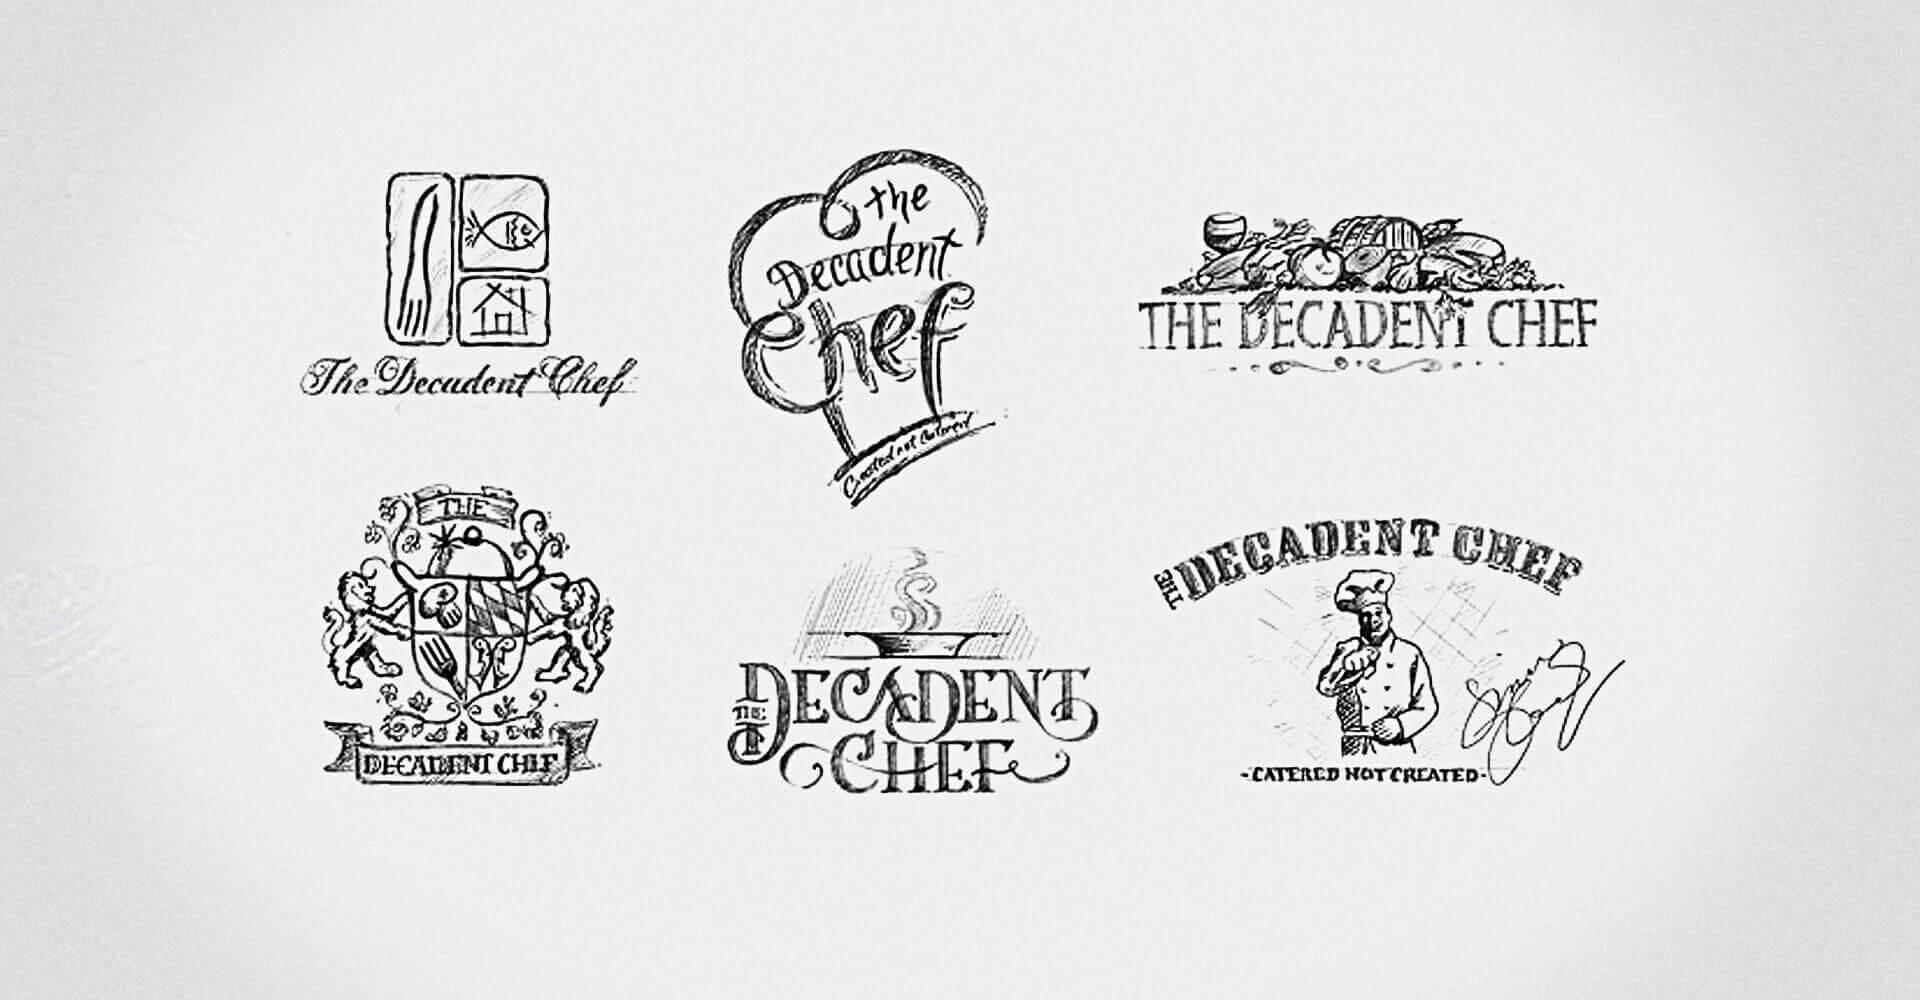 The Decadent Chef